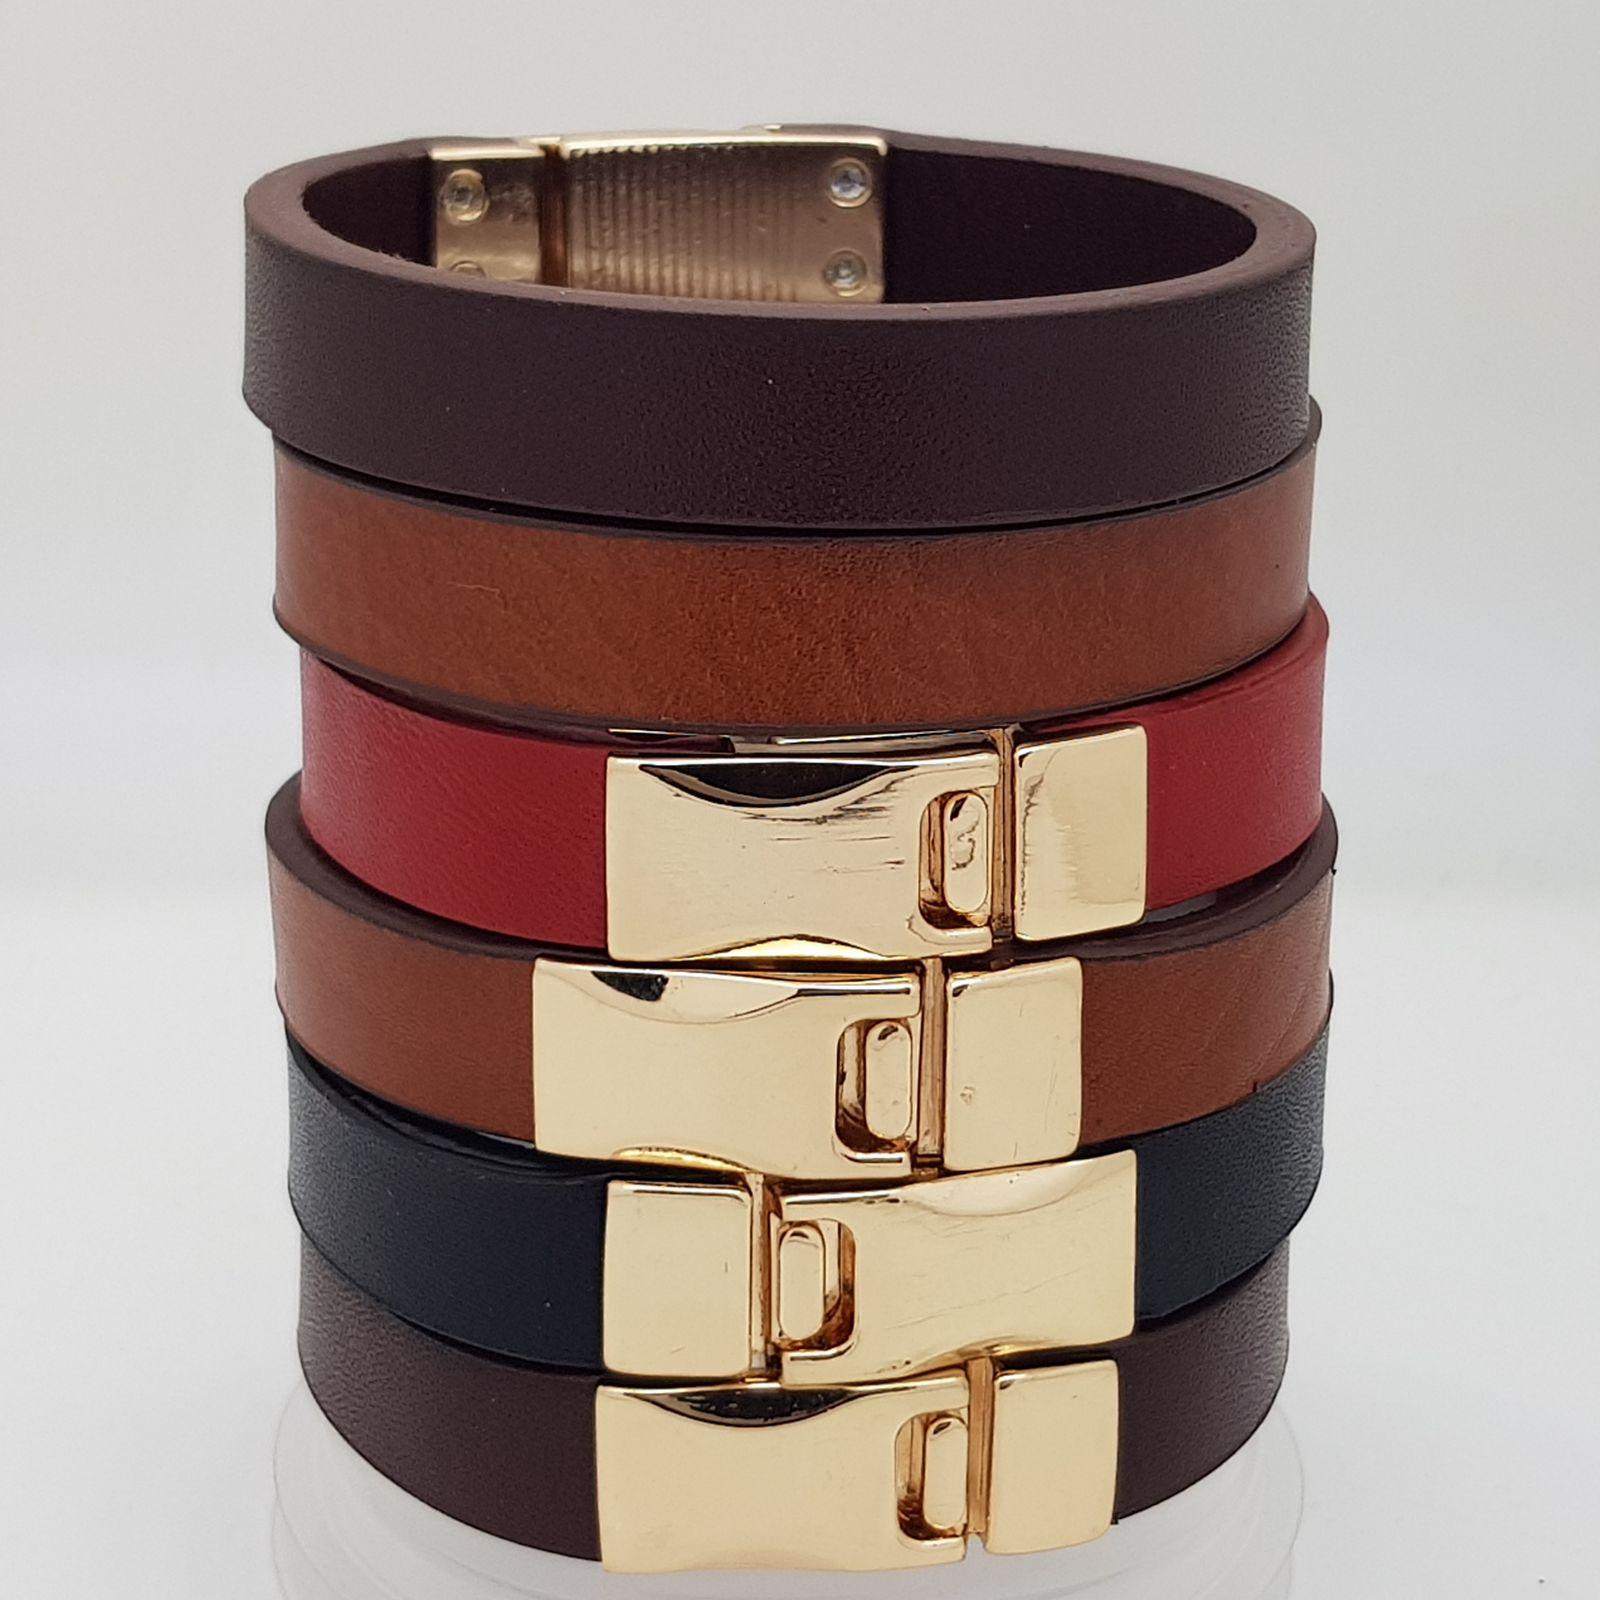 دستبند کد ۱۲۰ thumb 2 3